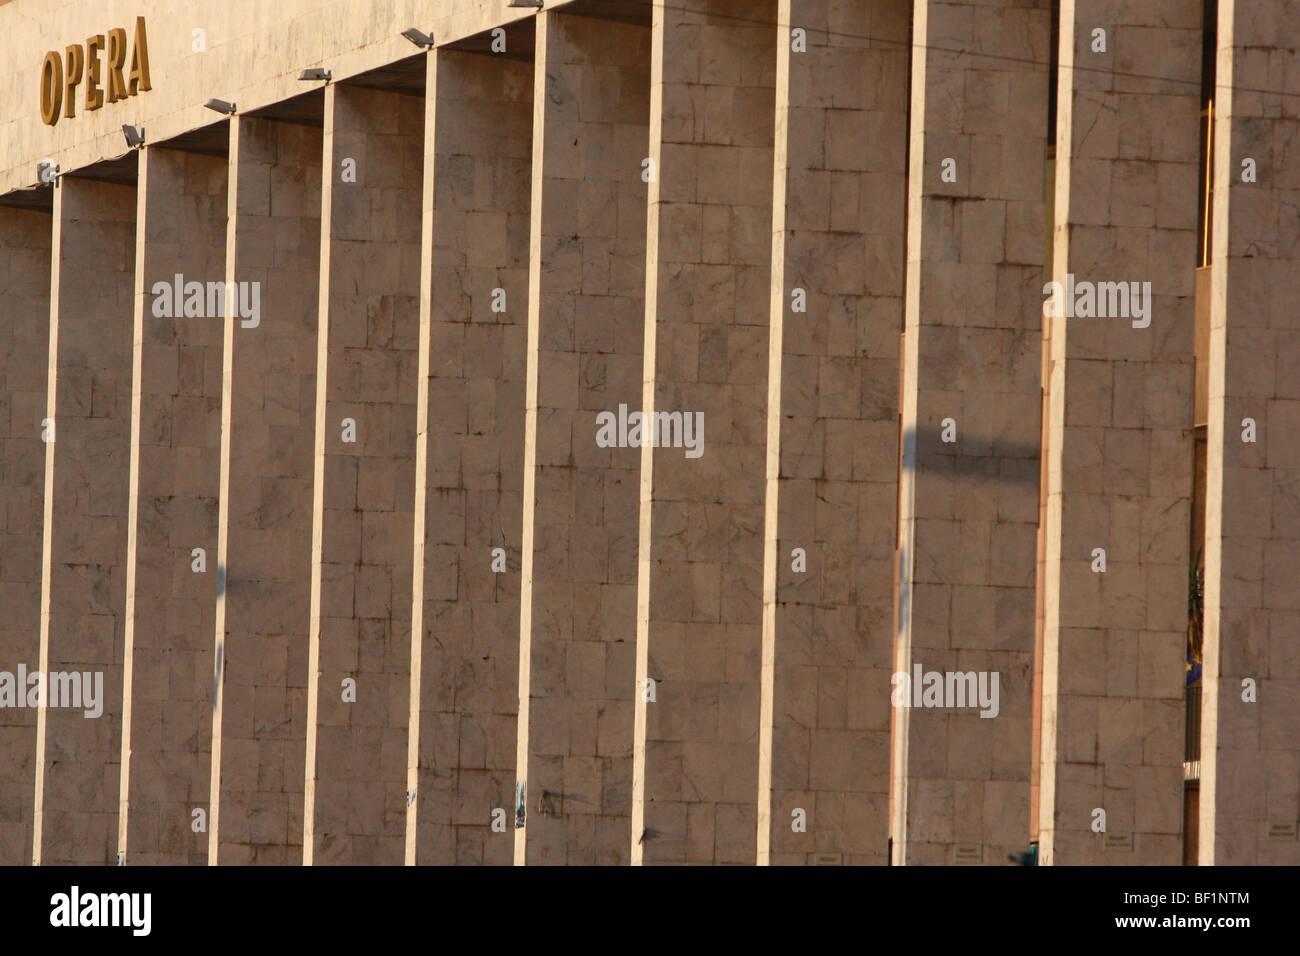 Colonnade of the Opera House in Skanderbeg Square, Tirana, Albania - Stock Image